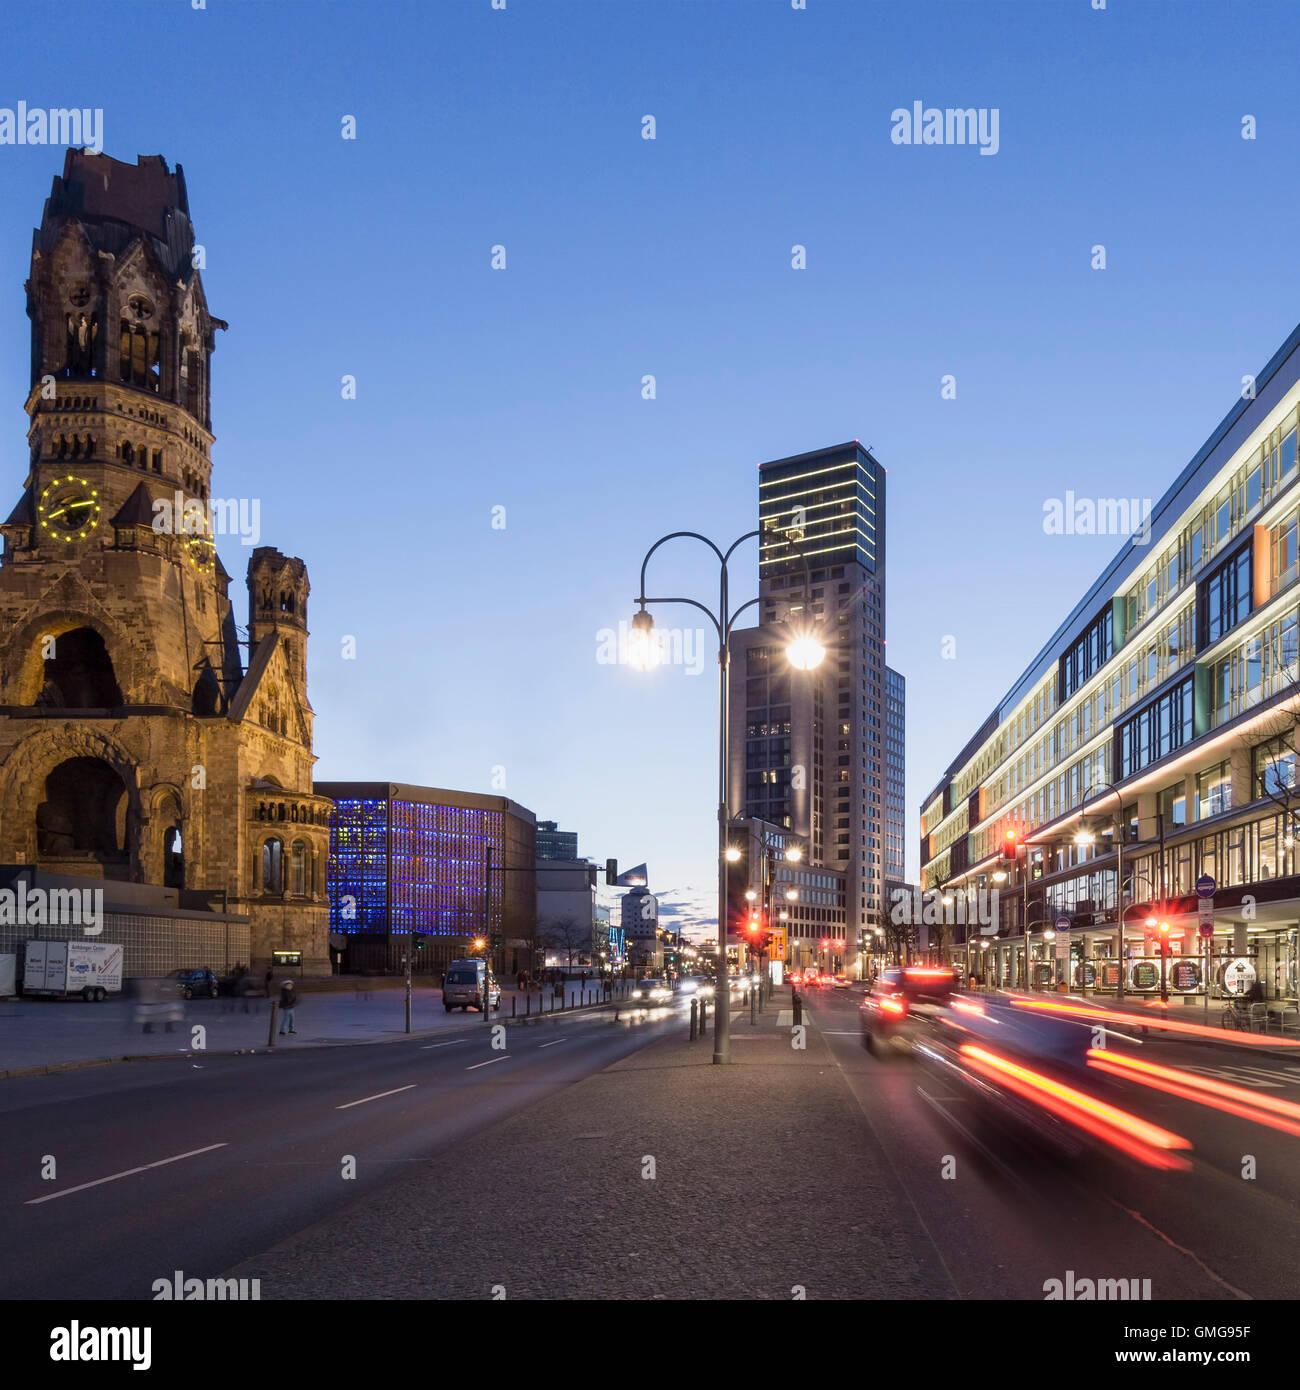 Bikini Shopping Center, Kaiser Wilhelm Memorial Church, Waldorf Astoria Hotel, Berlin, Stock Photo